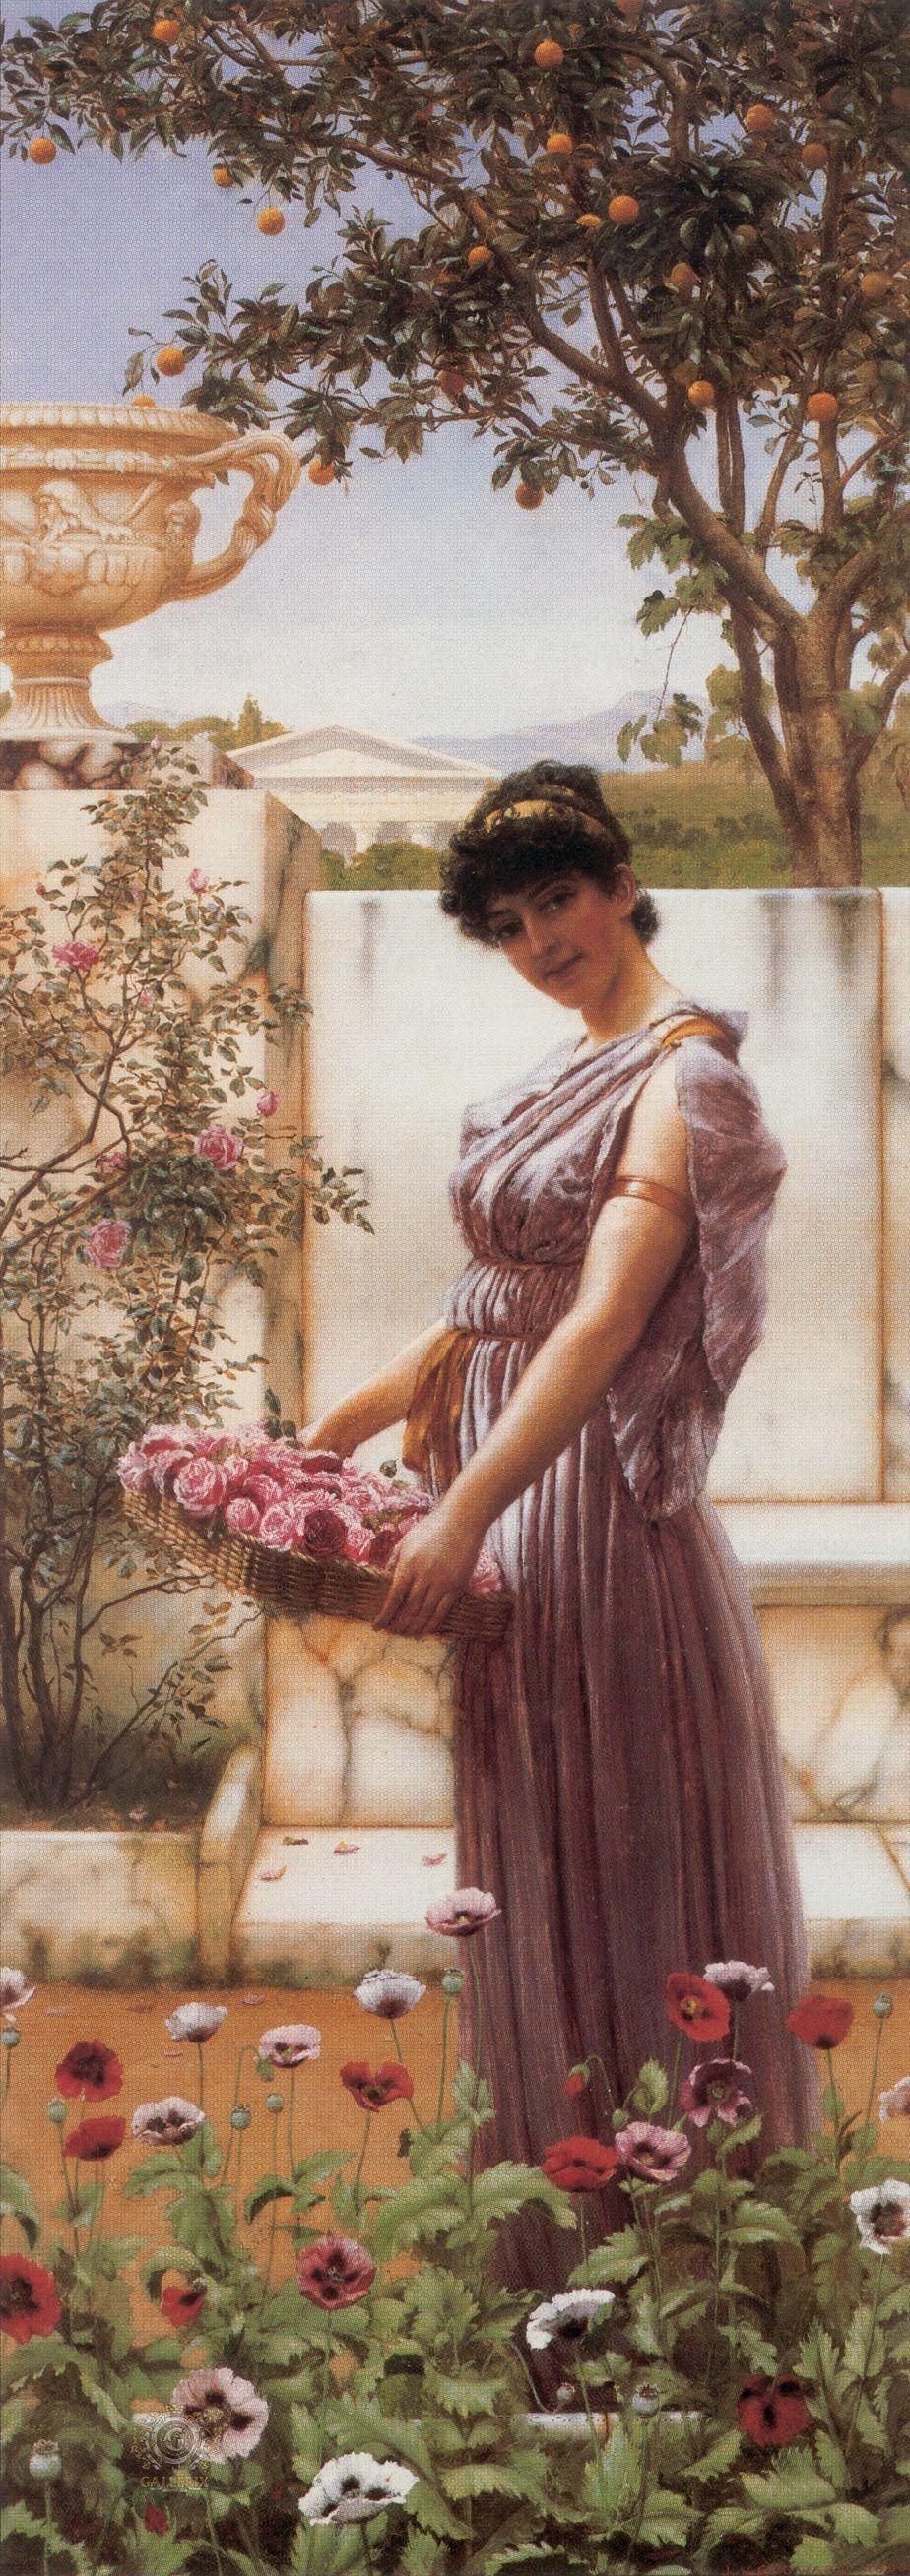 "John William Godward (18611922) ""The Flowers of Venus"